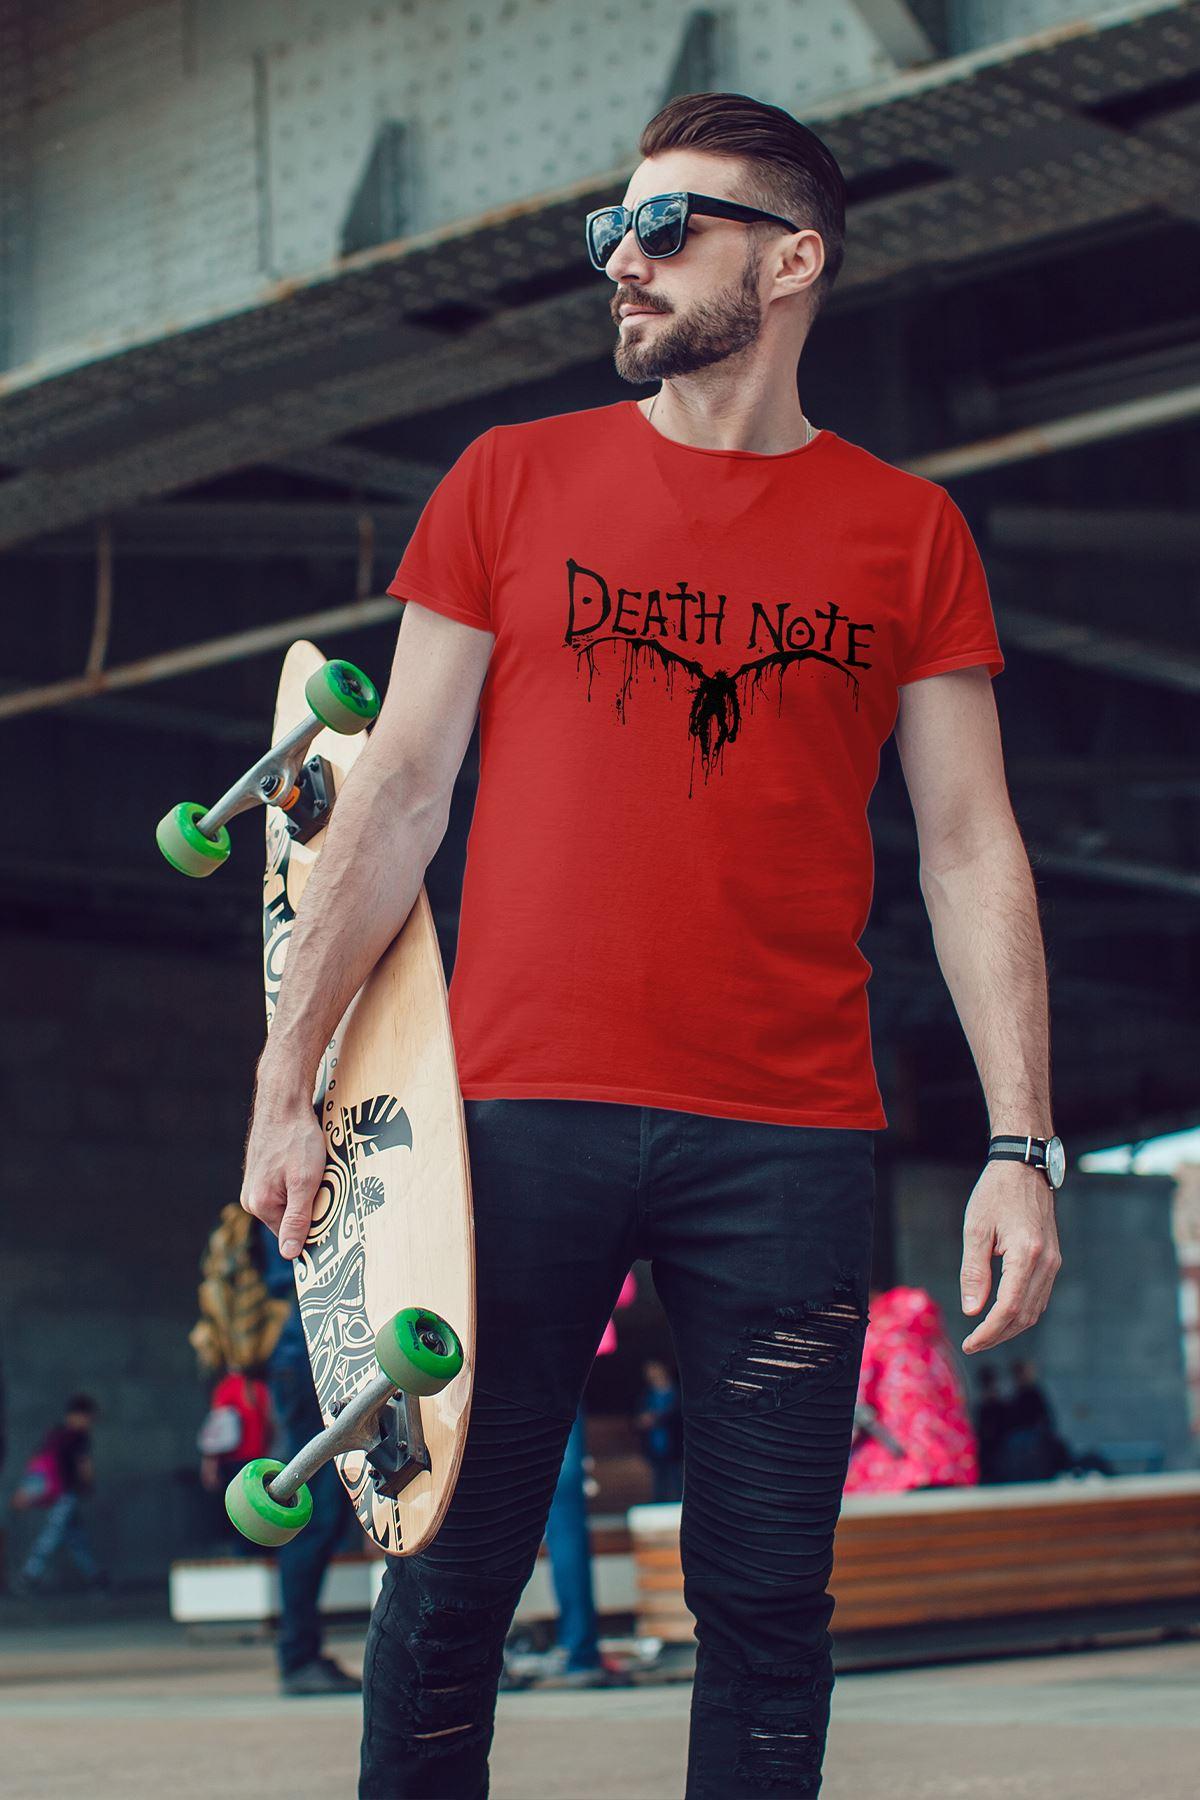 Anime Death Note 06 Kırmızı Erkek Tshirt - Tişört